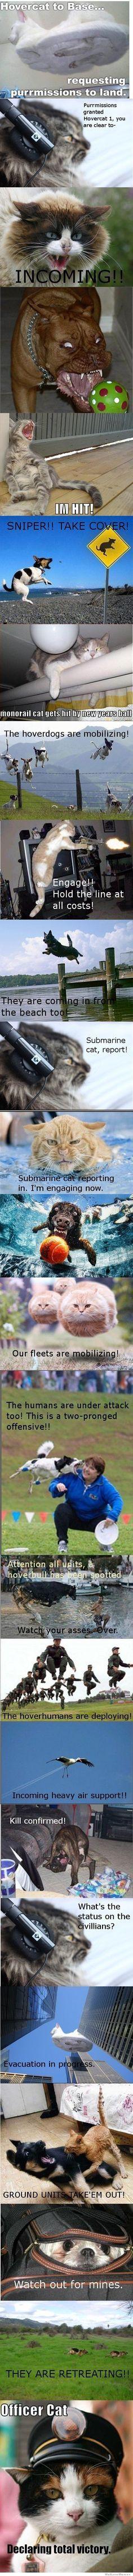 Gambar Animasi Binatang Lucu Bergerak Kucing Loncat Tapi Gak